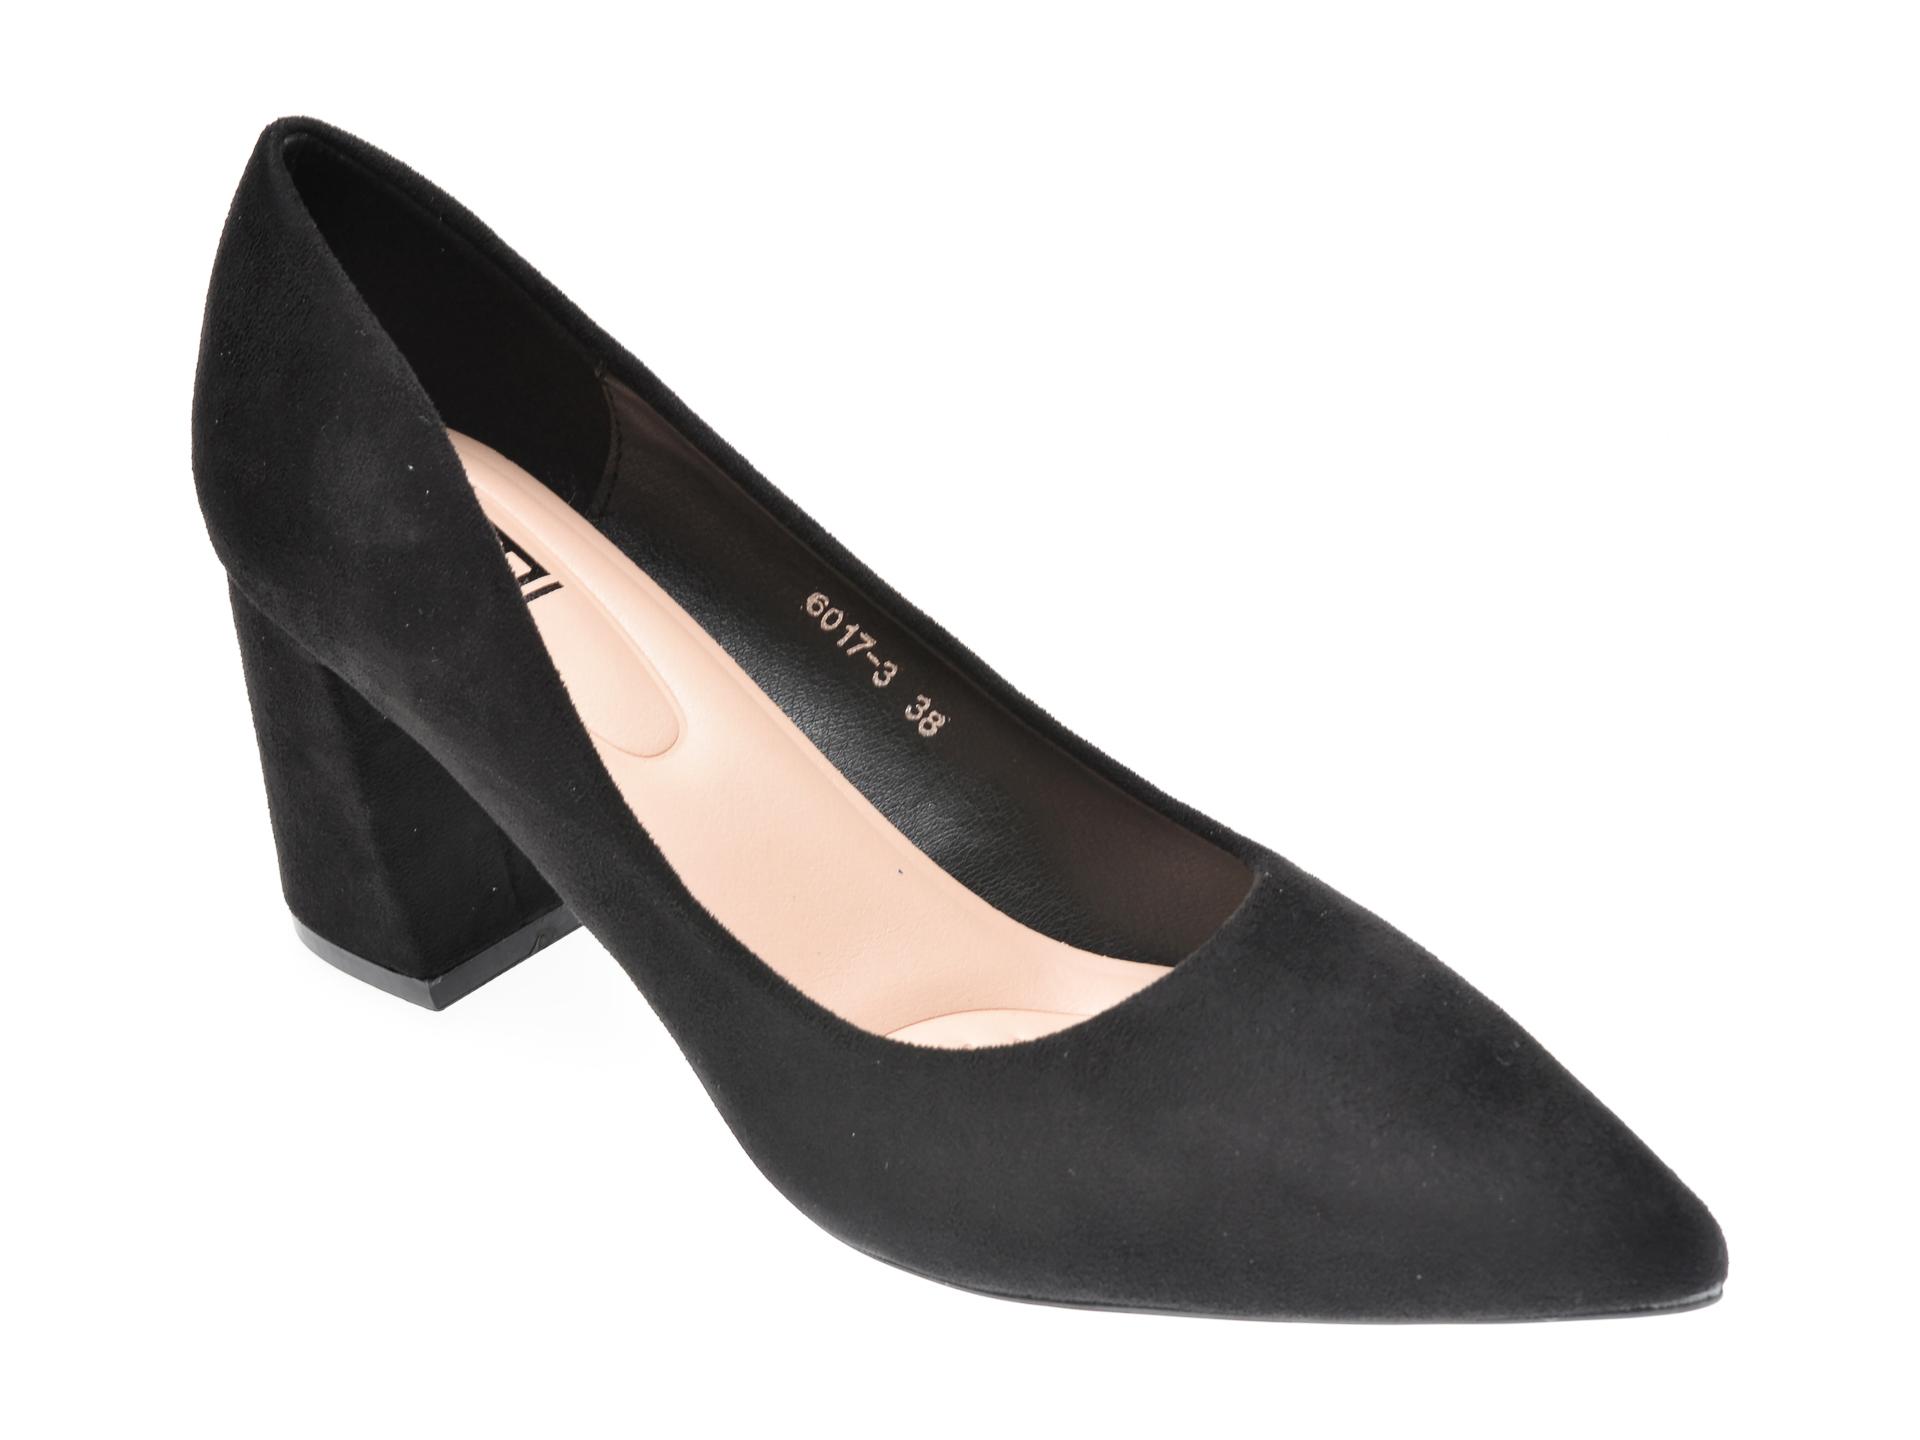 Pantofi RIO FIORE negri, 6017, din piele ecologica imagine